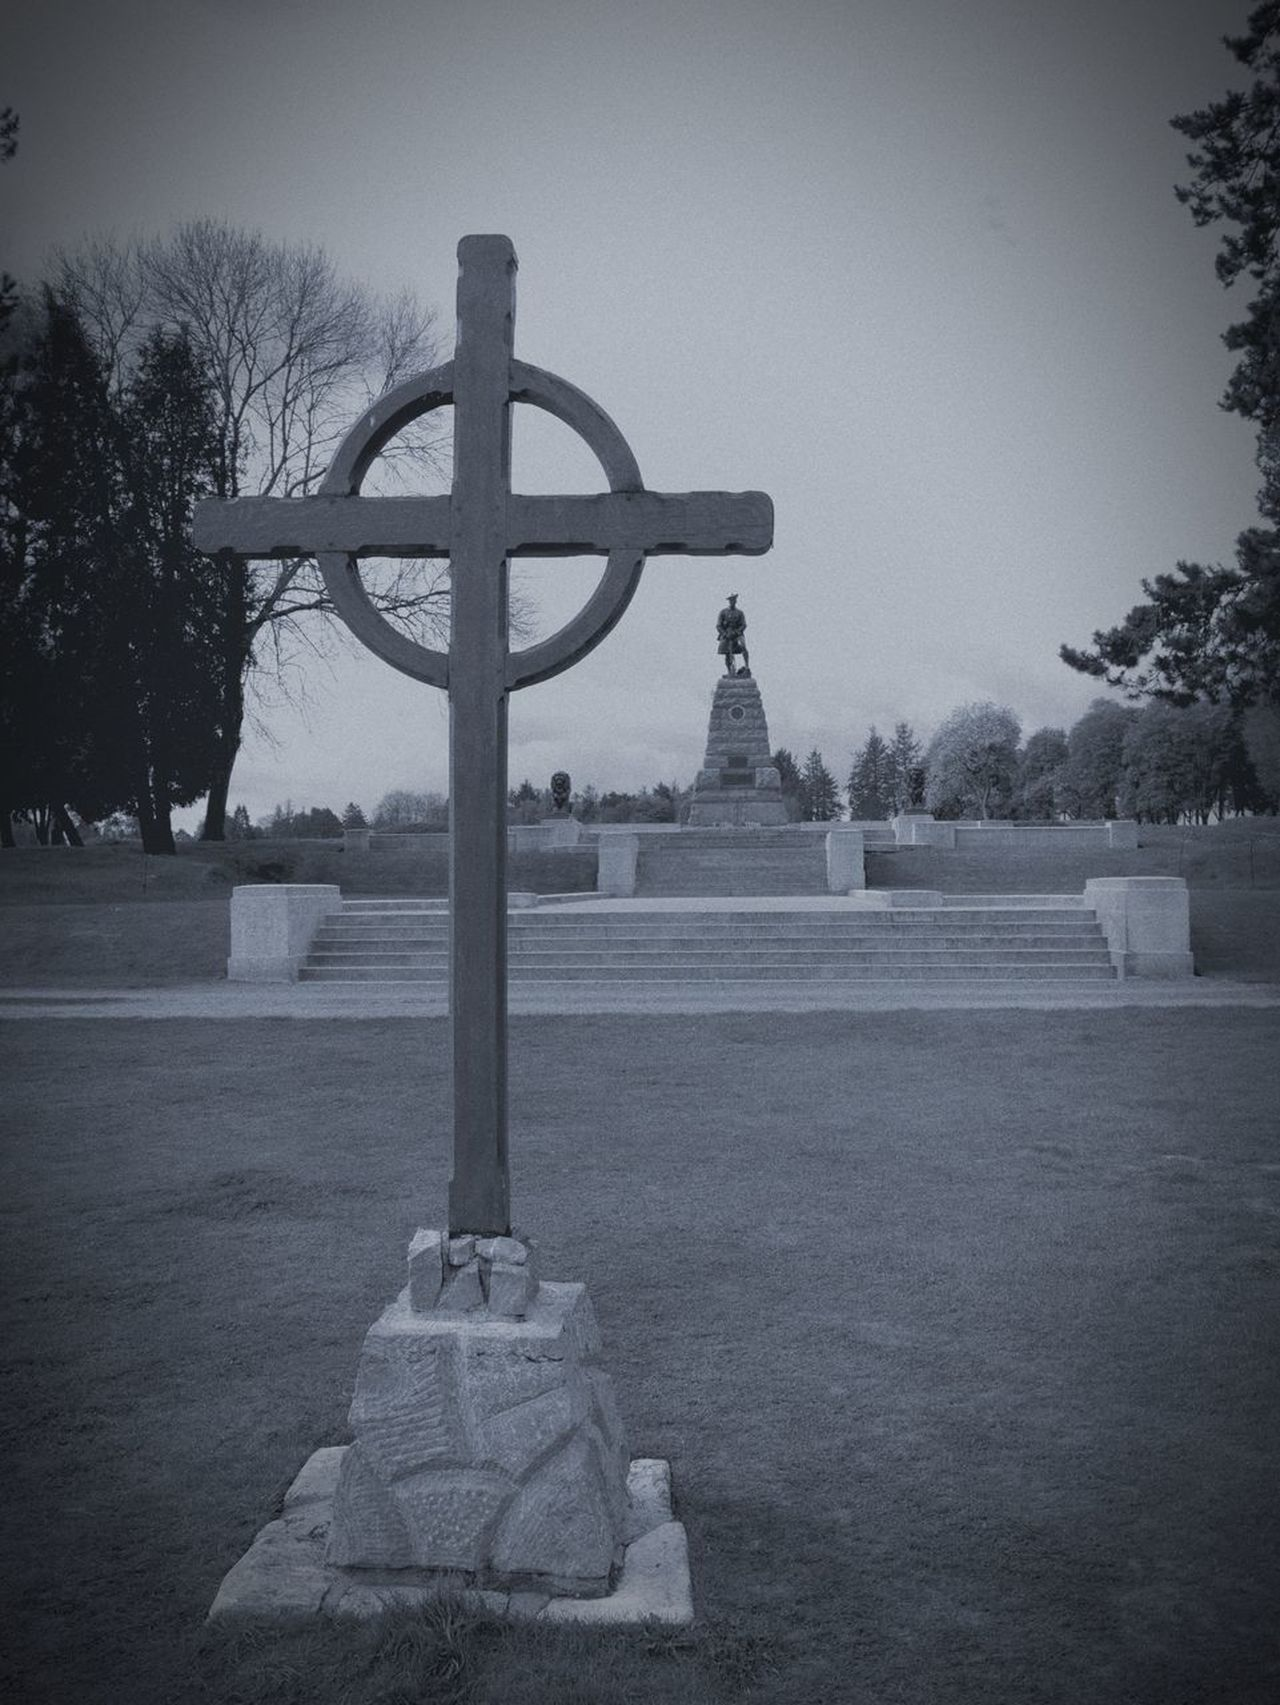 Cross Cross Cemetery Somme Cemetery Ww1 War Memorial Picardy France Beaumont- Hamel Memorial Newfoundland War Memorial